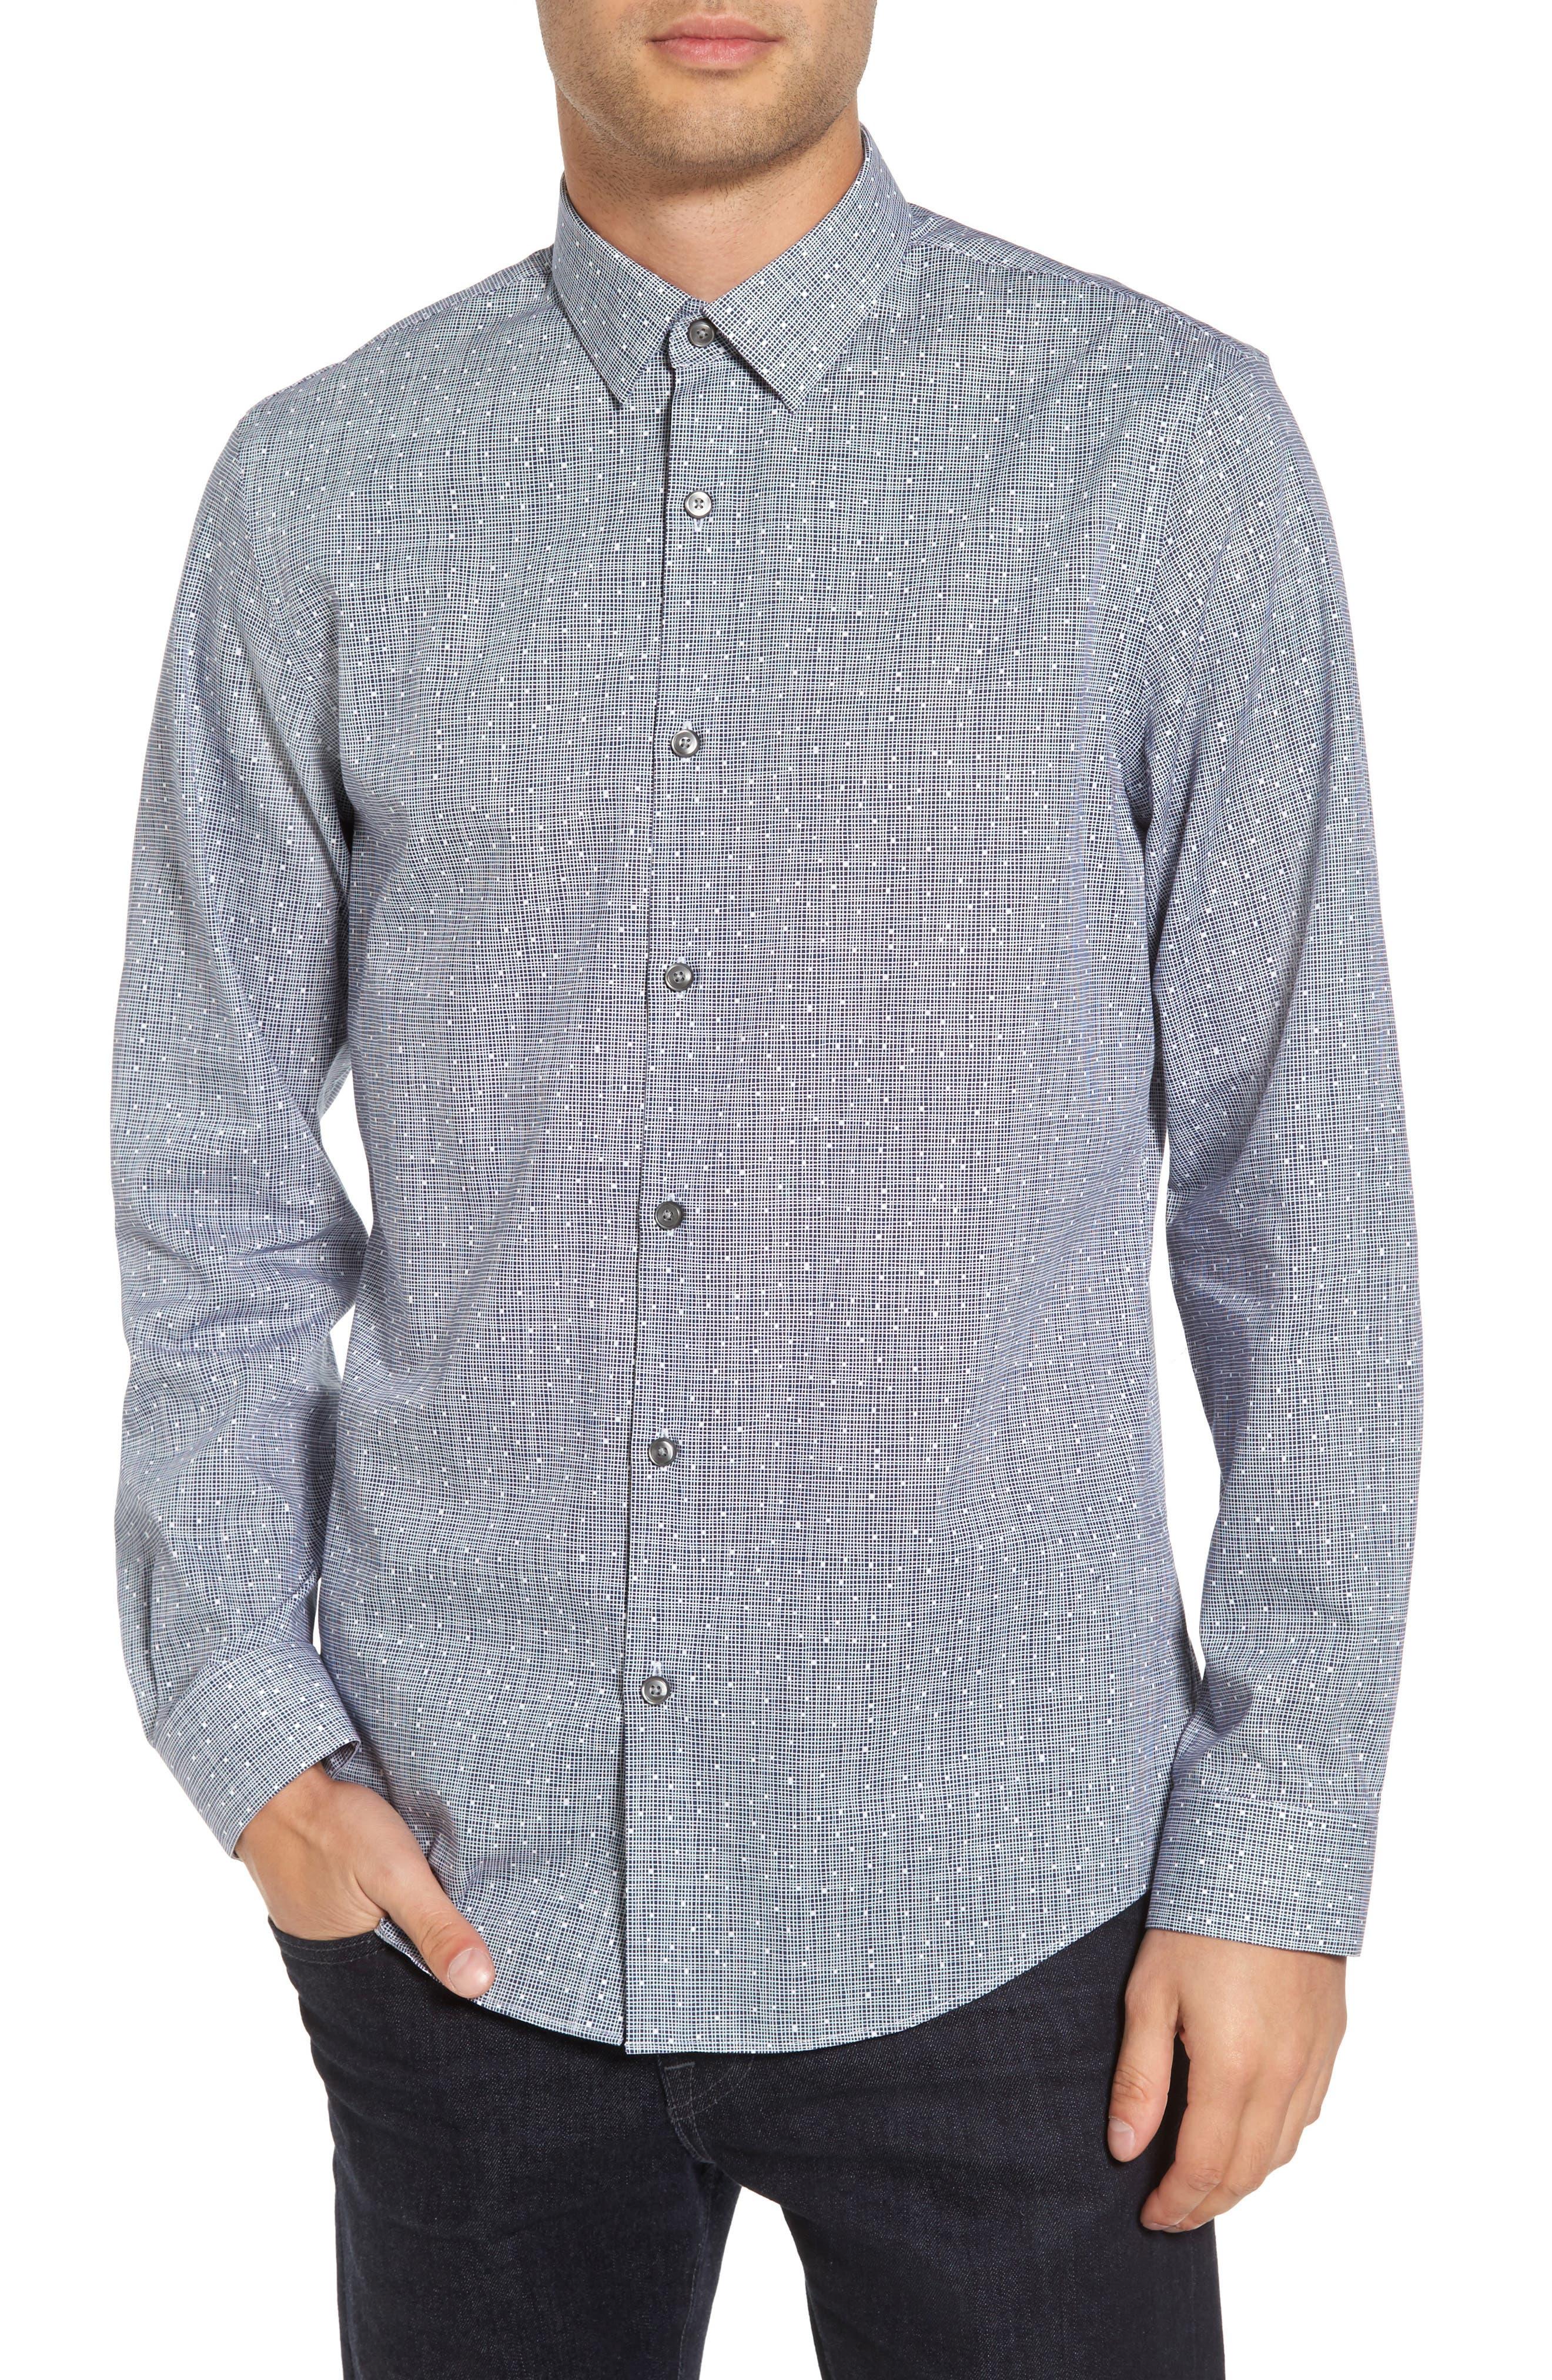 Main Image - Calibrate Slim Fit No-Iron Print Sport Shirt